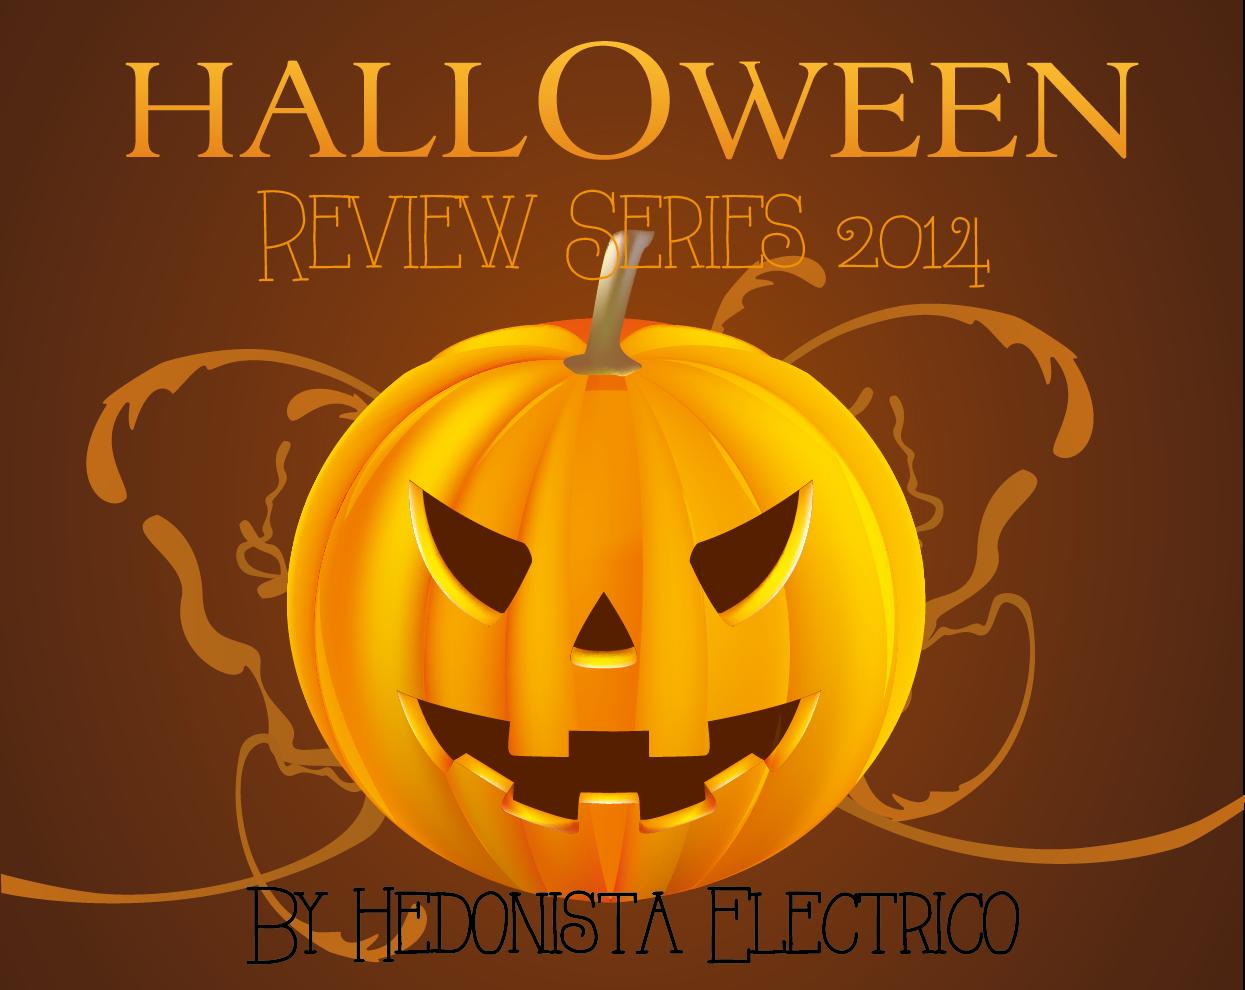 HedonistaElectrico Halloween Review Series Bob EsponjaNoche